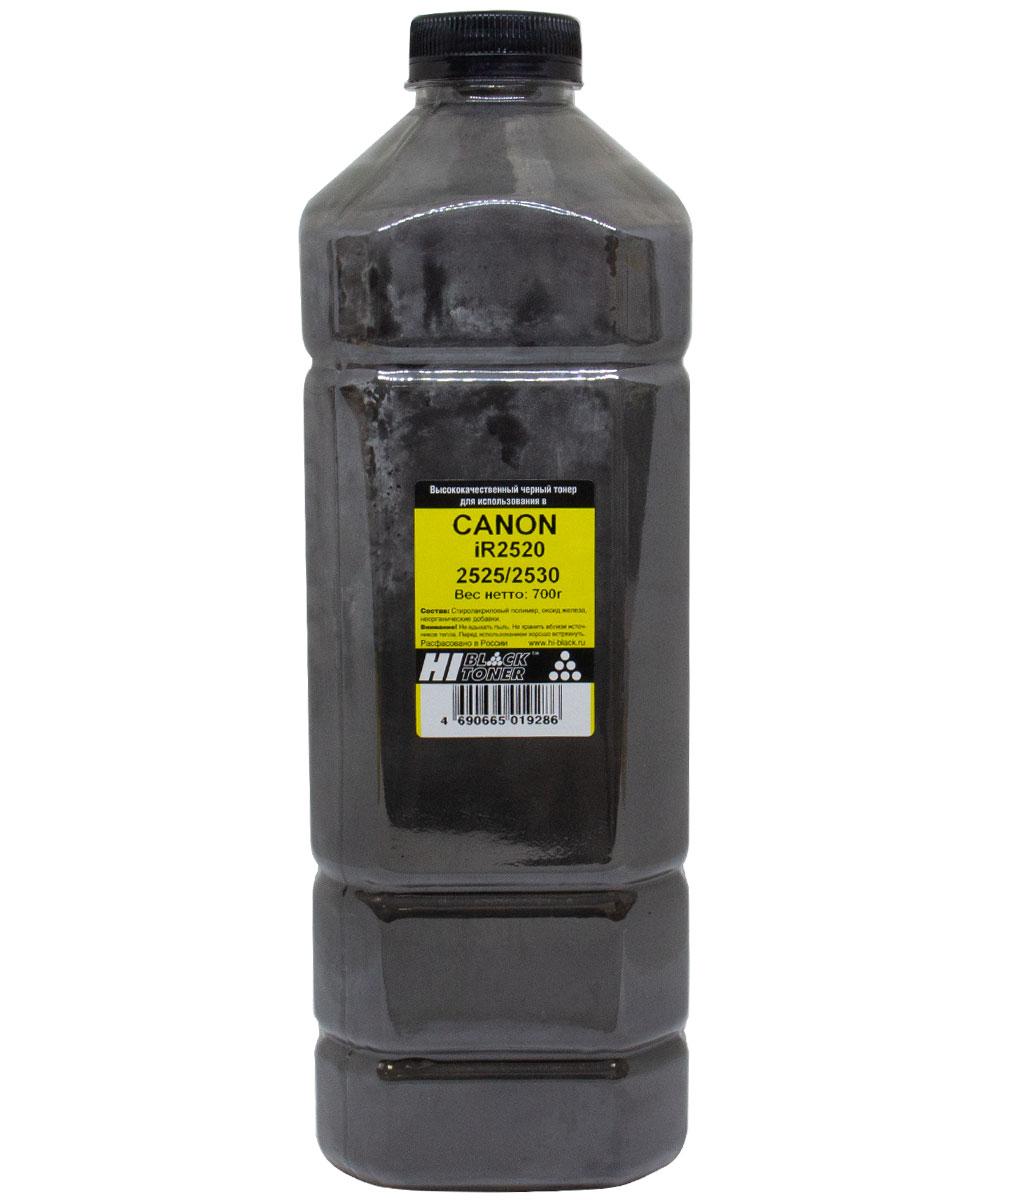 Тонер Hi-Black для Canon iR 2520/2525/2530, Bk, 700 г, канистра